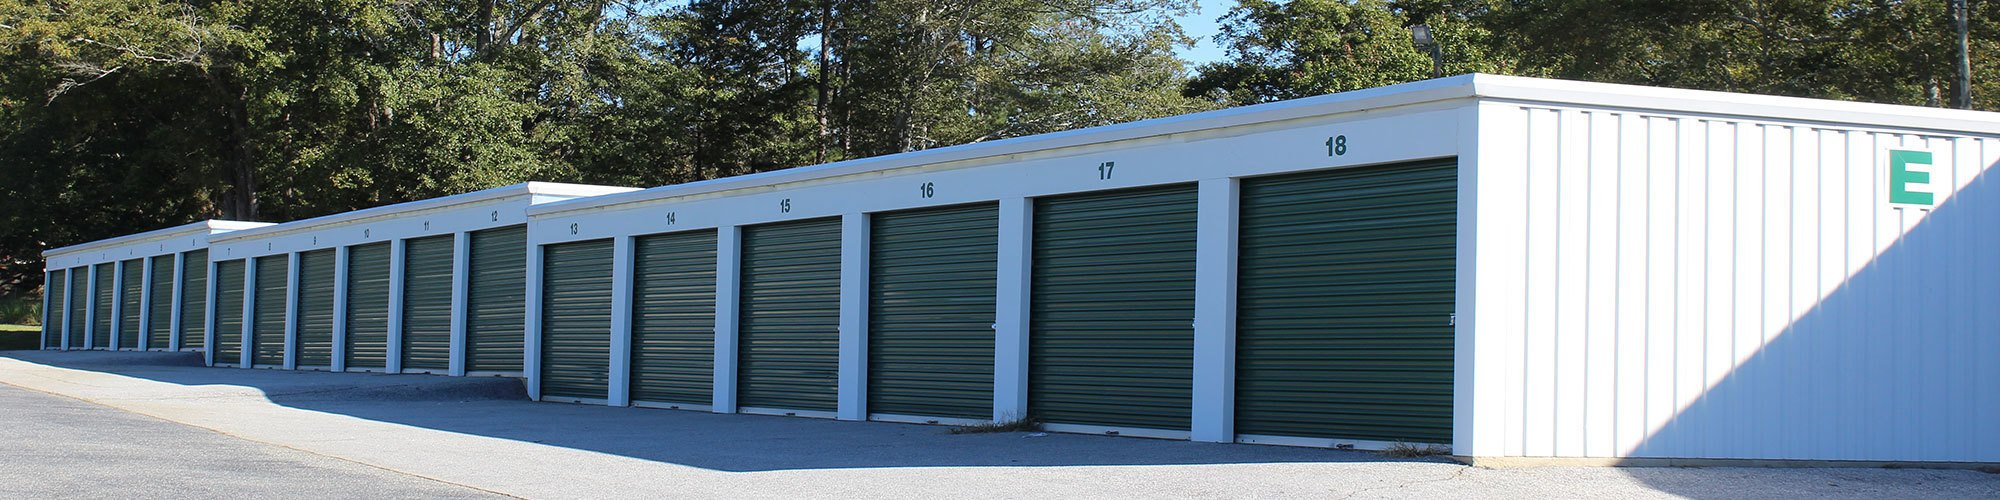 built p storage garage rock new midlands rent west to in for property alum